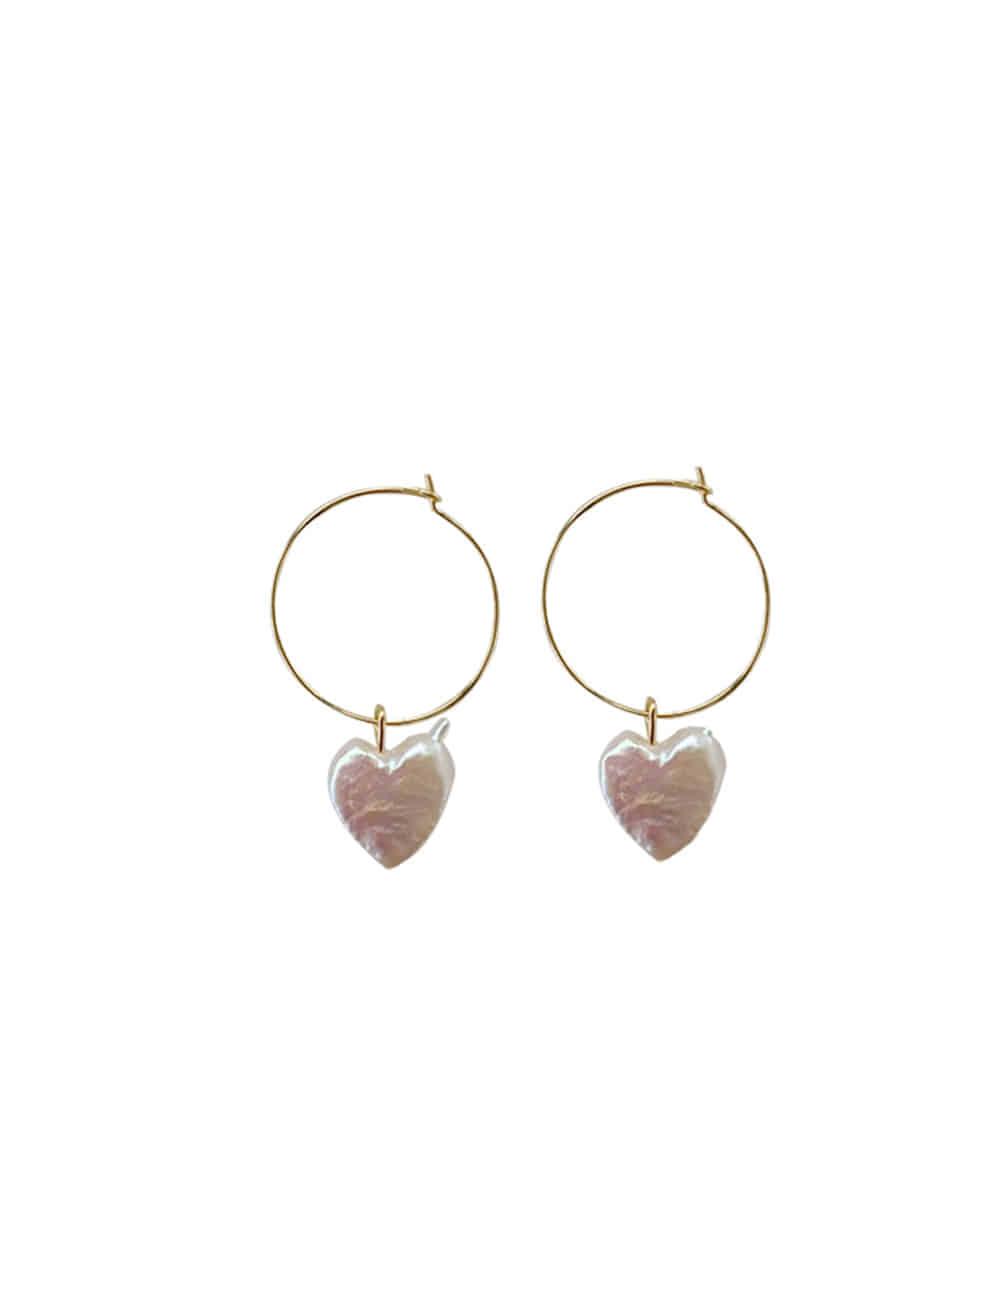 925 Silver Nature Heart Ring Earrings _ 하트 진주 링귀걸이 라비쉬에